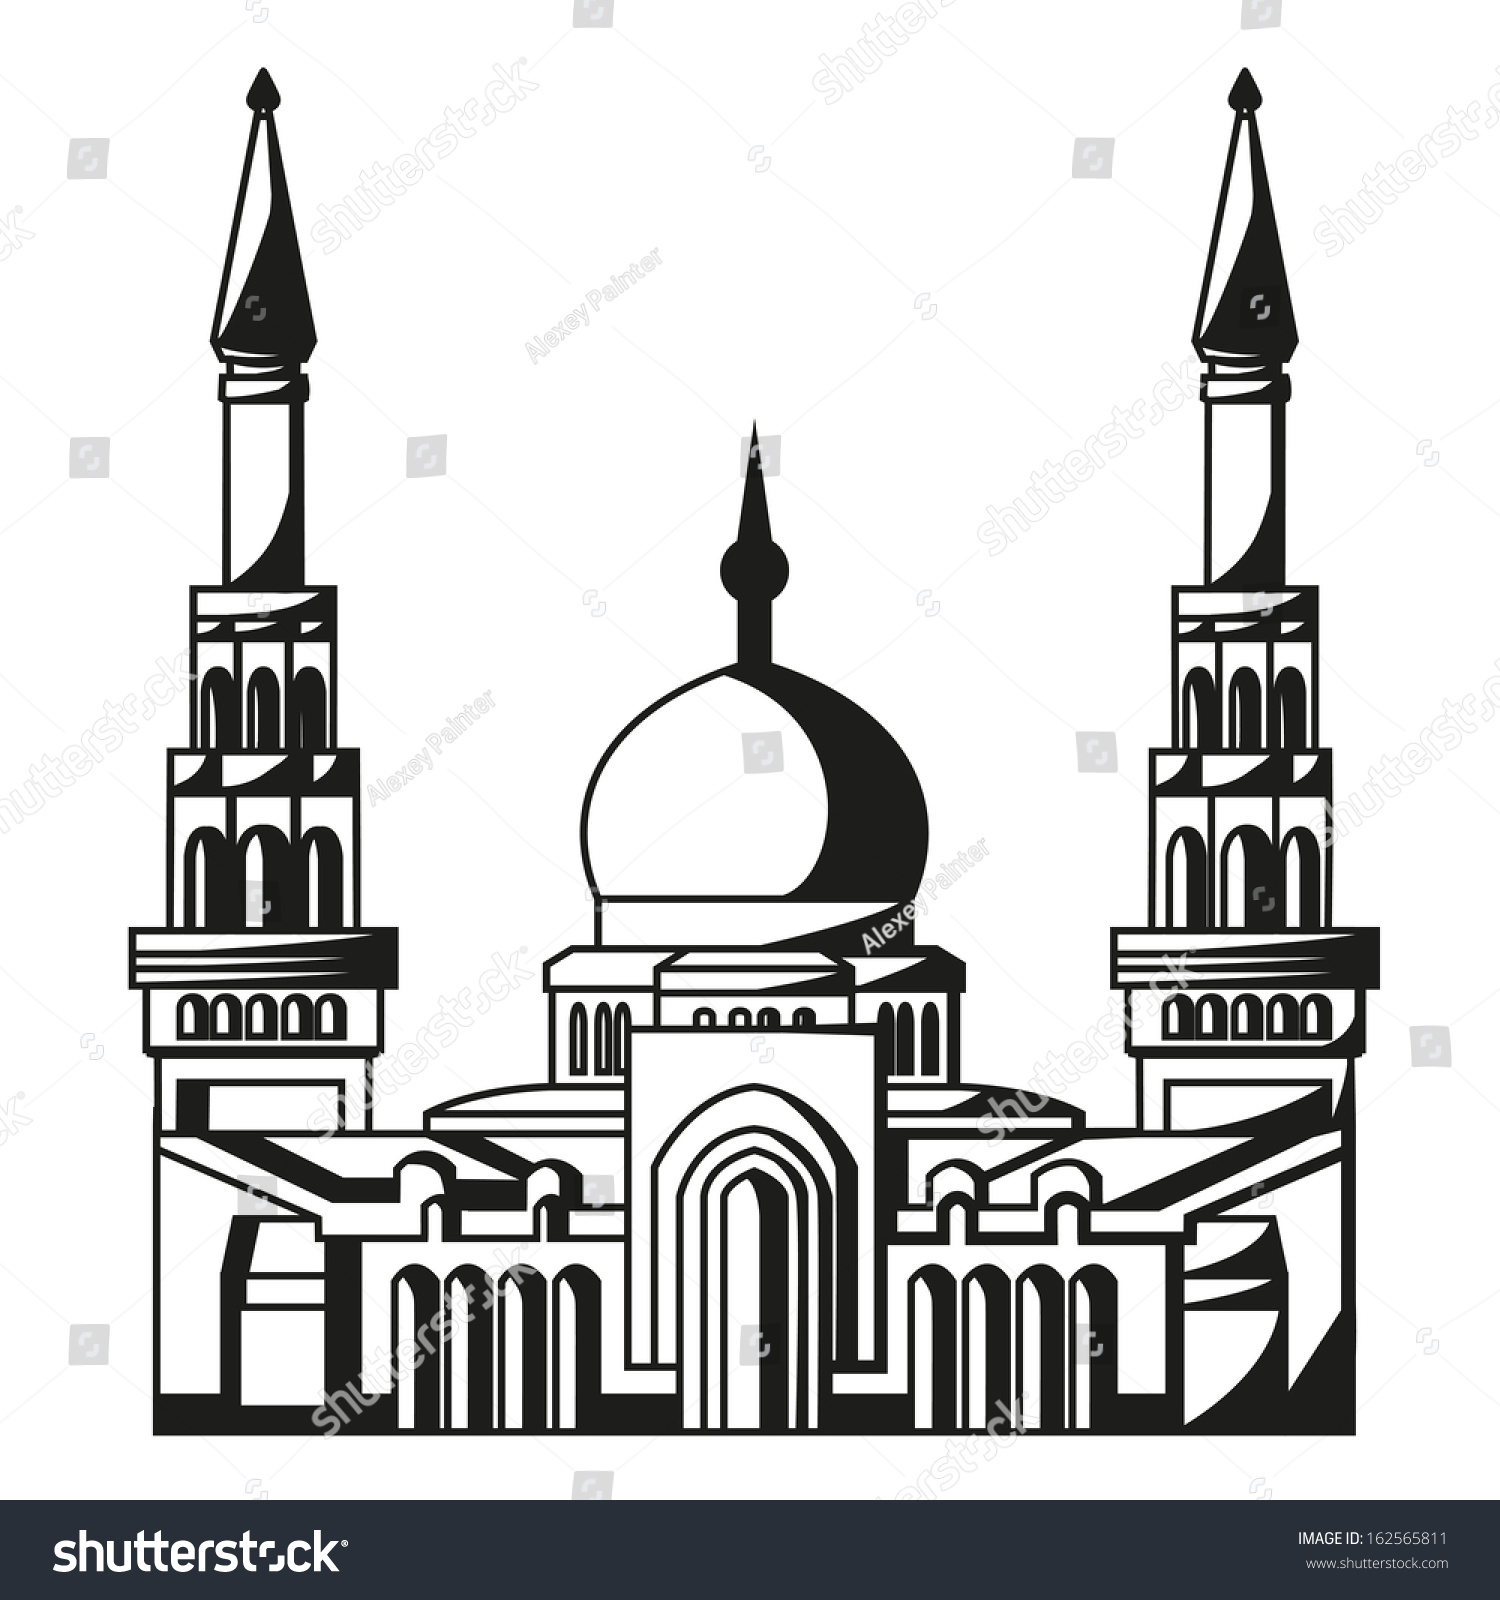 Symbol islam silhouette mosque ramadan vector stock vector symbol of islam silhouette of mosque ramadan vector illustration eps10 biocorpaavc Images